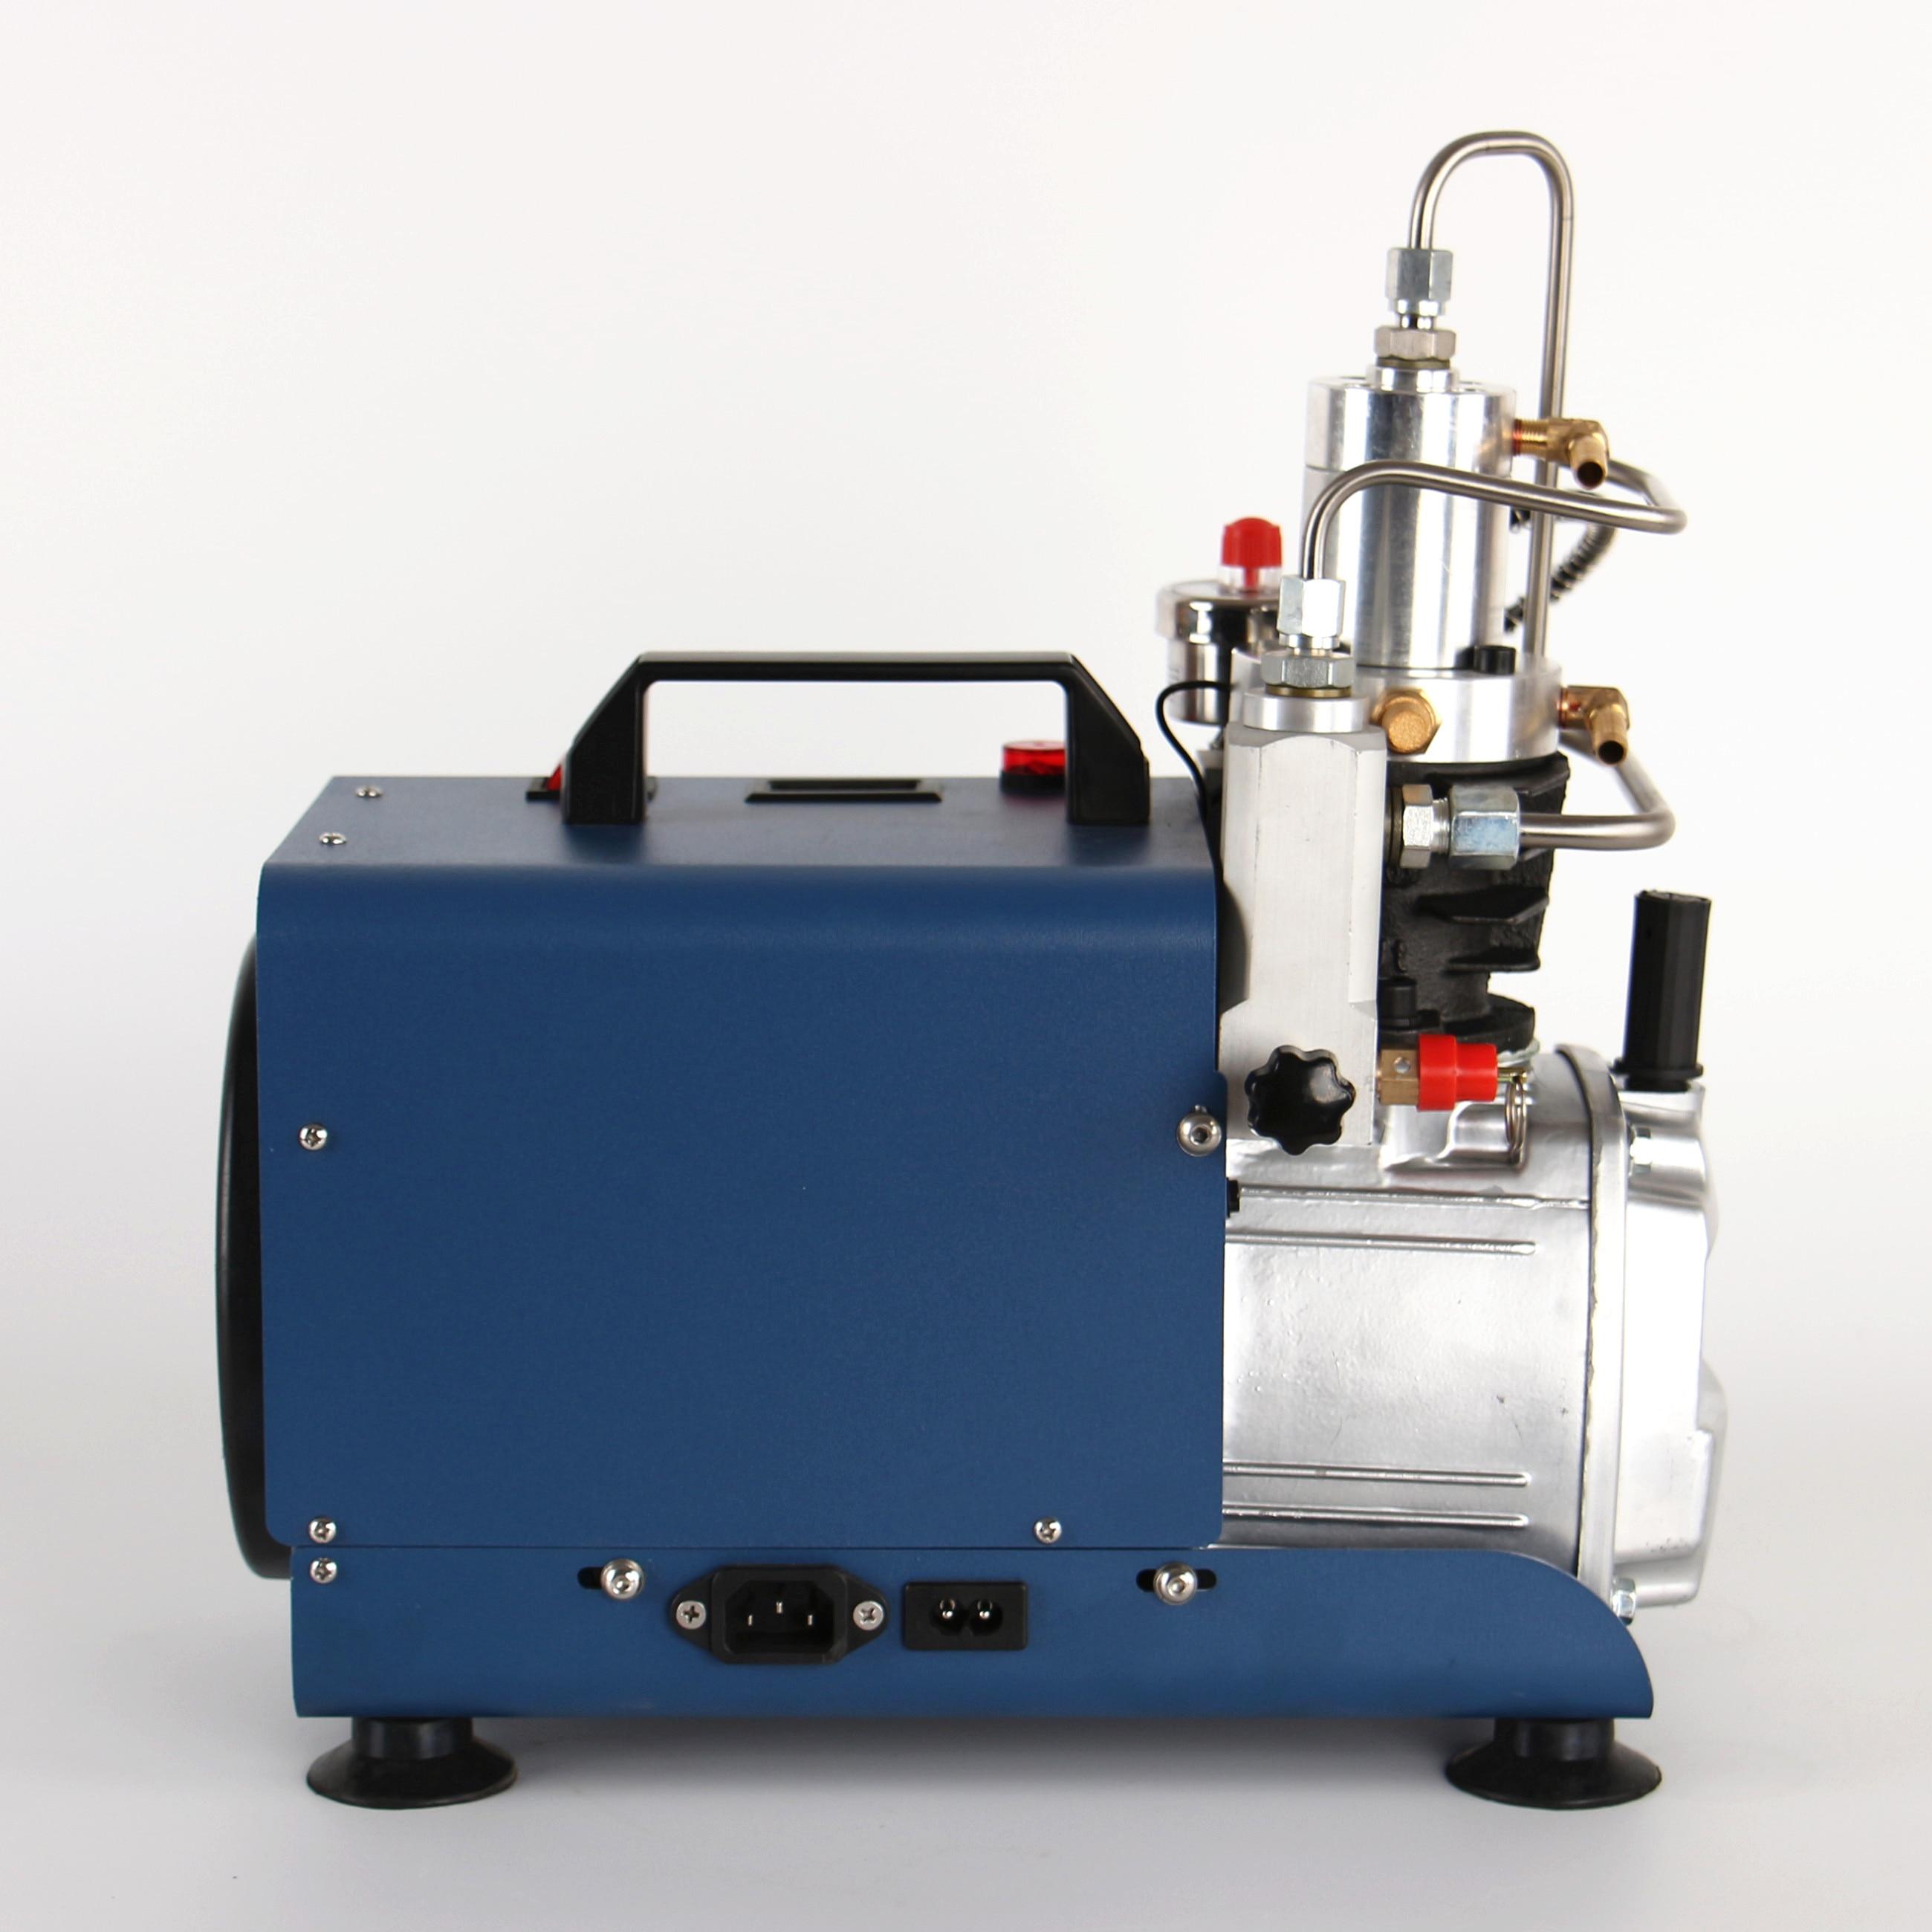 300BAR 30MPA 4500PSI Electric Air Compressor High Pressure Air Pump for Pneumatic Airgun Scuba Rifle PCP Inflator 220v 110v - 6